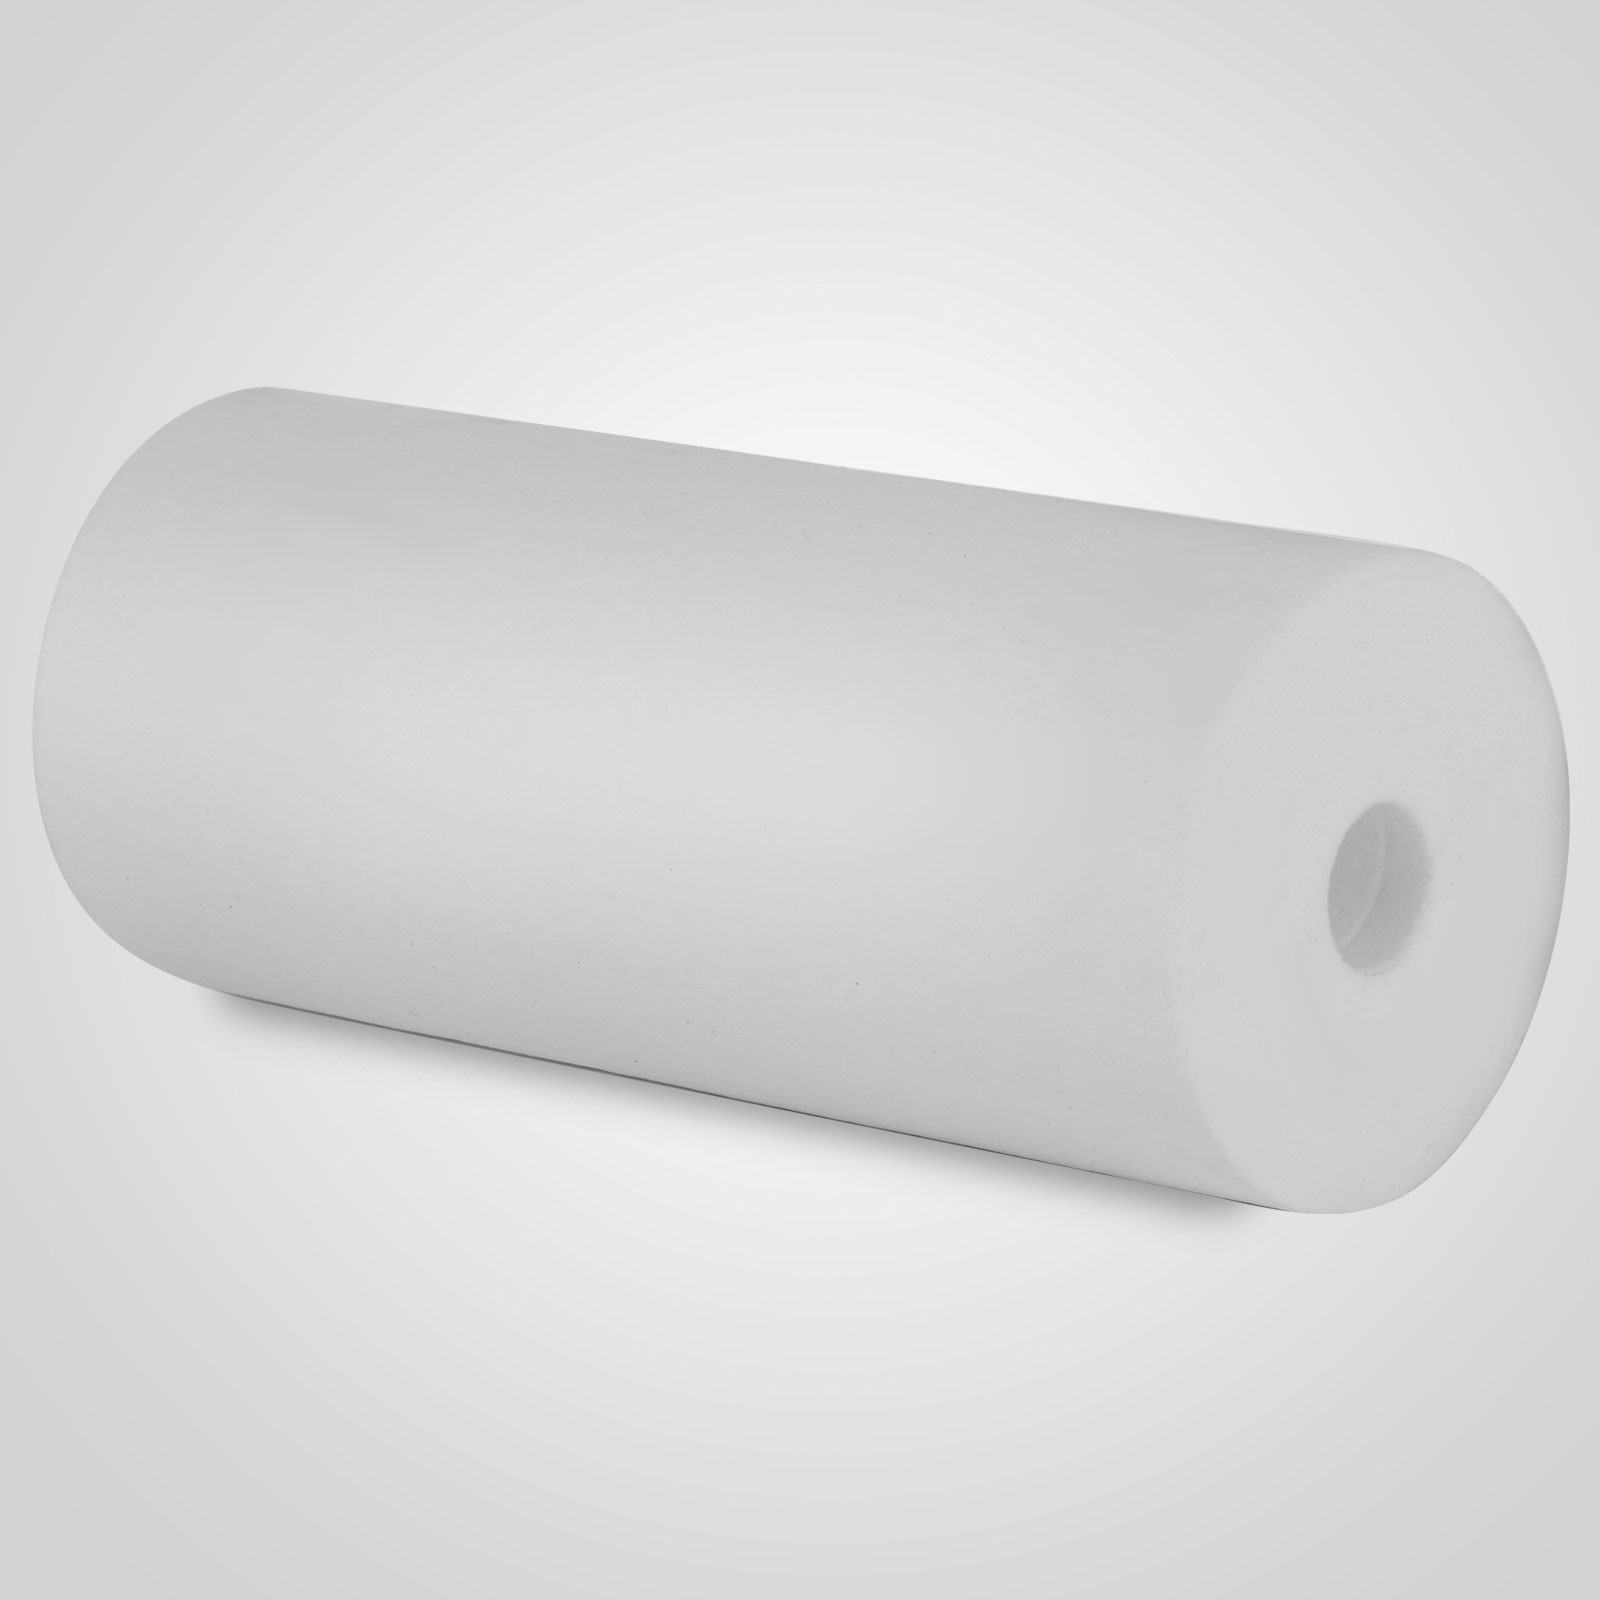 20Pcs-Cartouche-Filtrante-5-Micron-10-034-X-4-5-034-as-Brita-Emballe-Individu-Bobine miniature 5